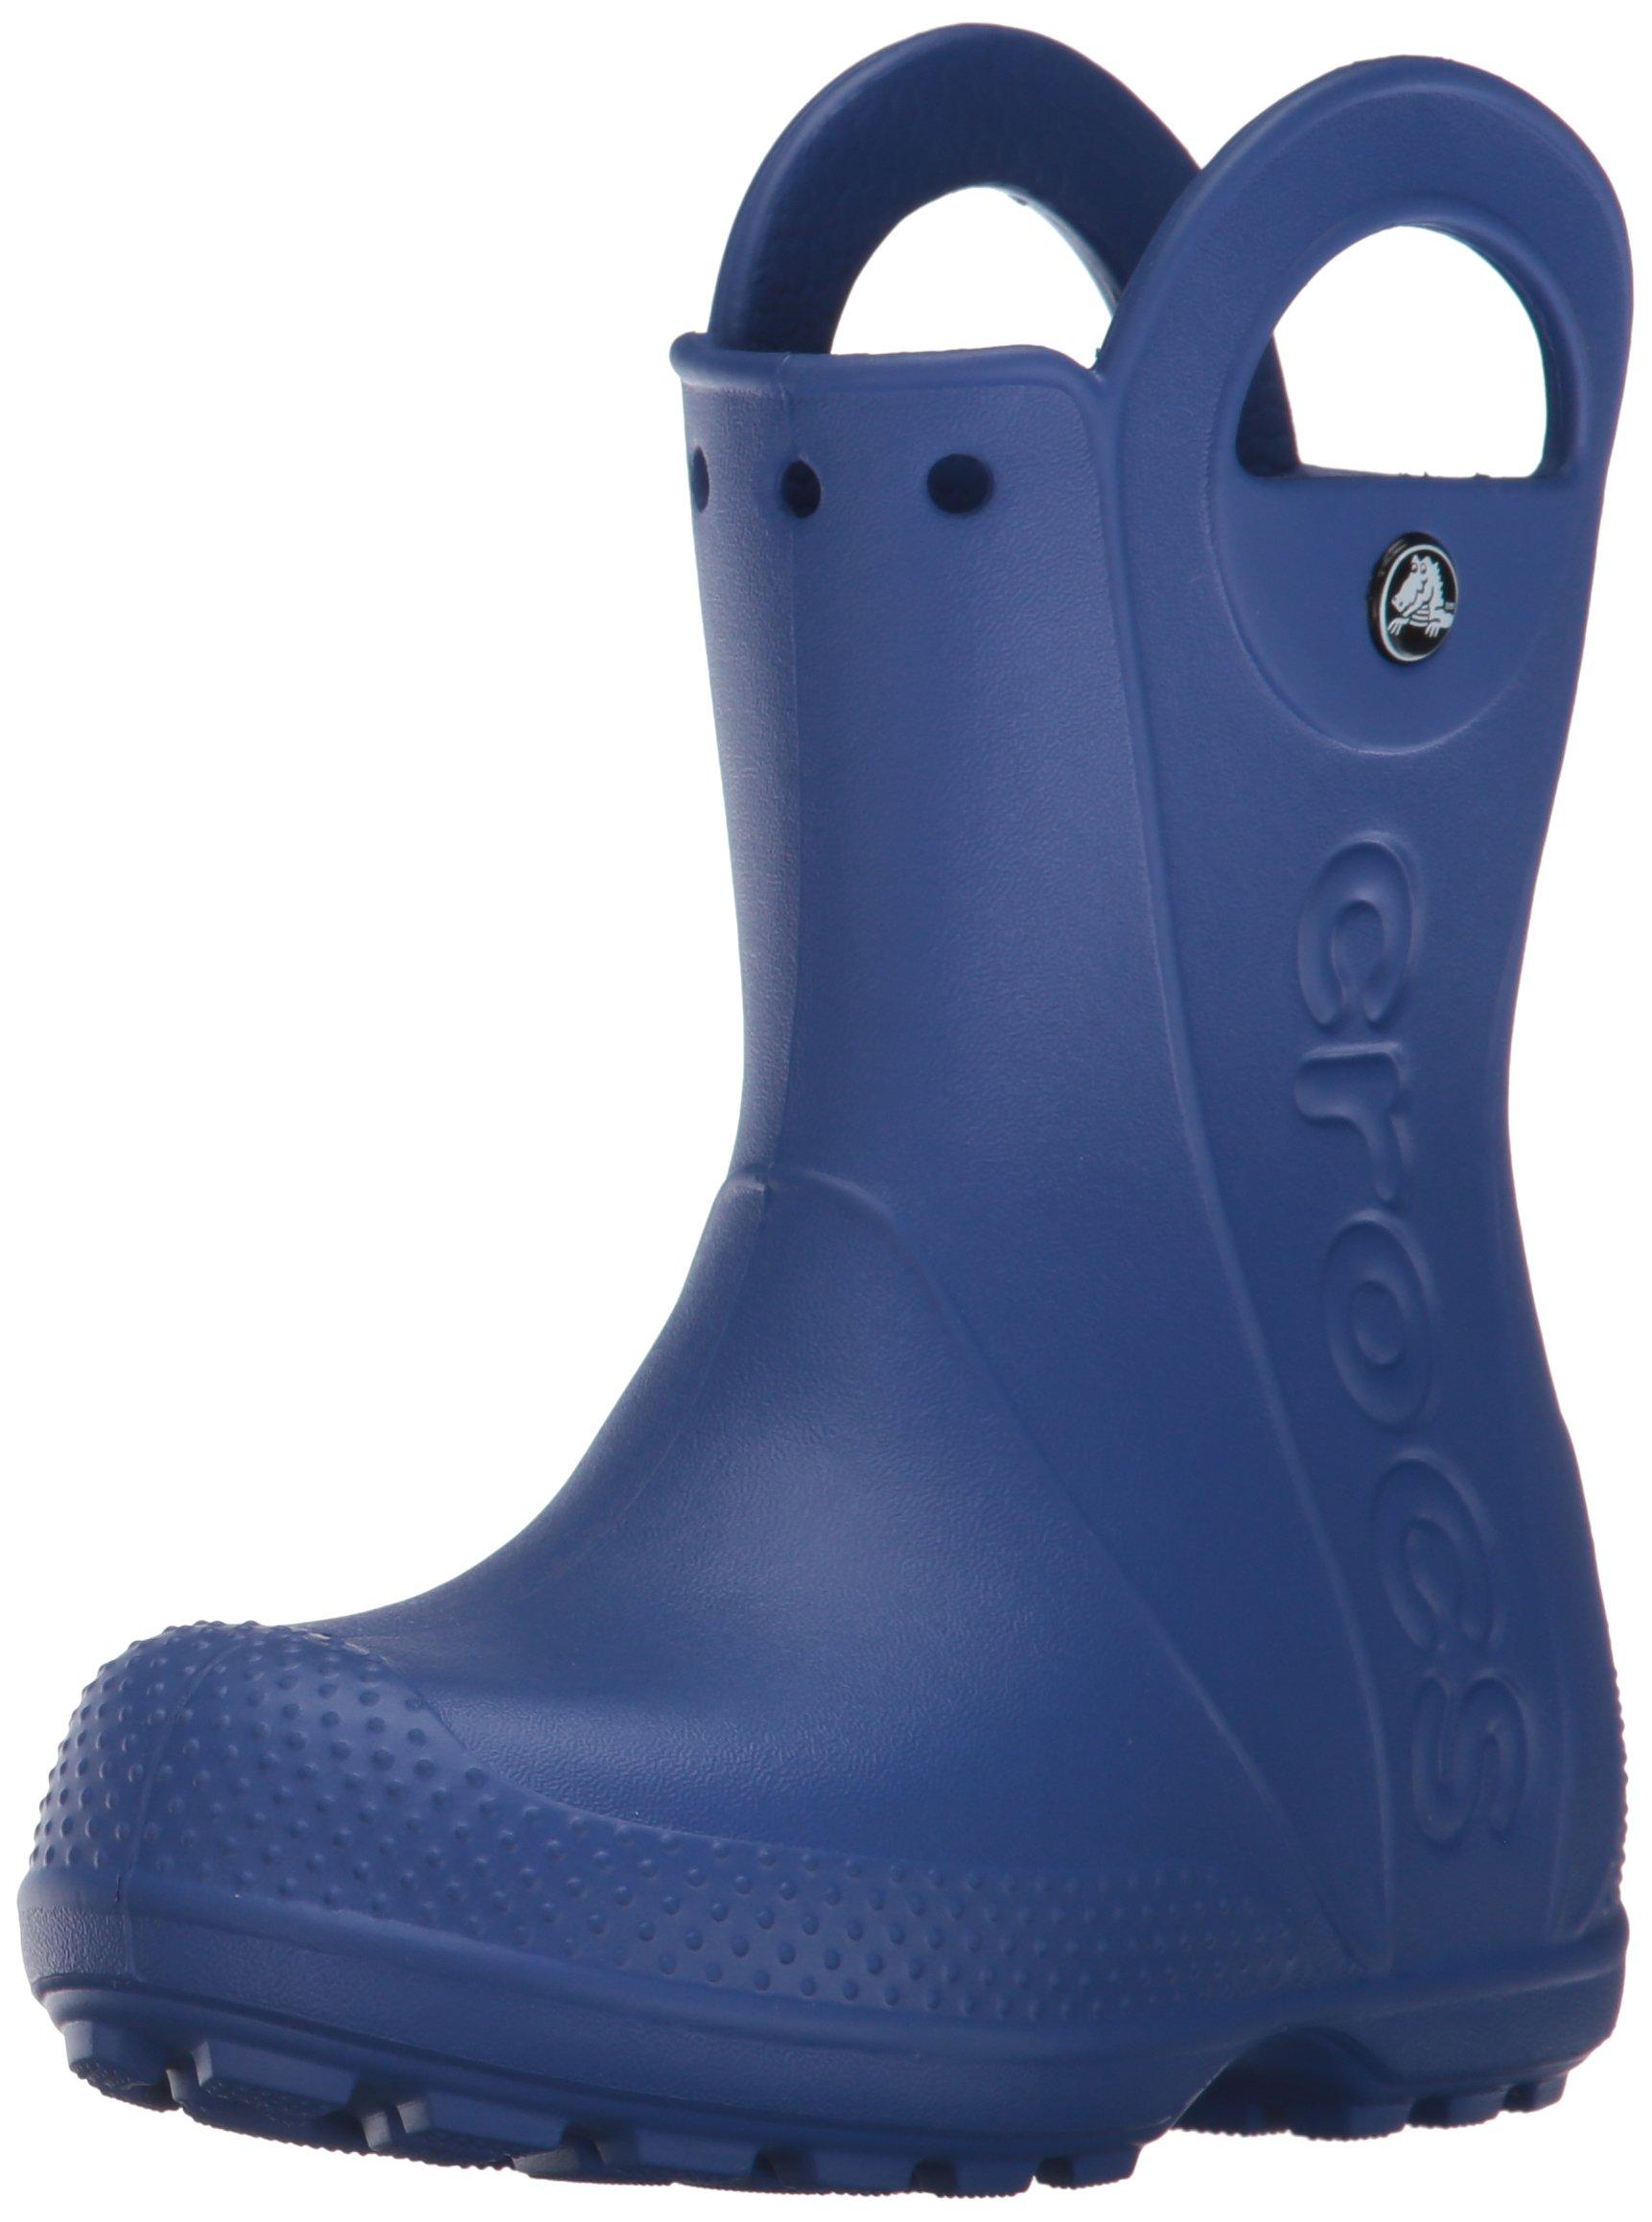 Crocs Kids' Handle It Boot,Cerulean Blue,10 M US Toddler